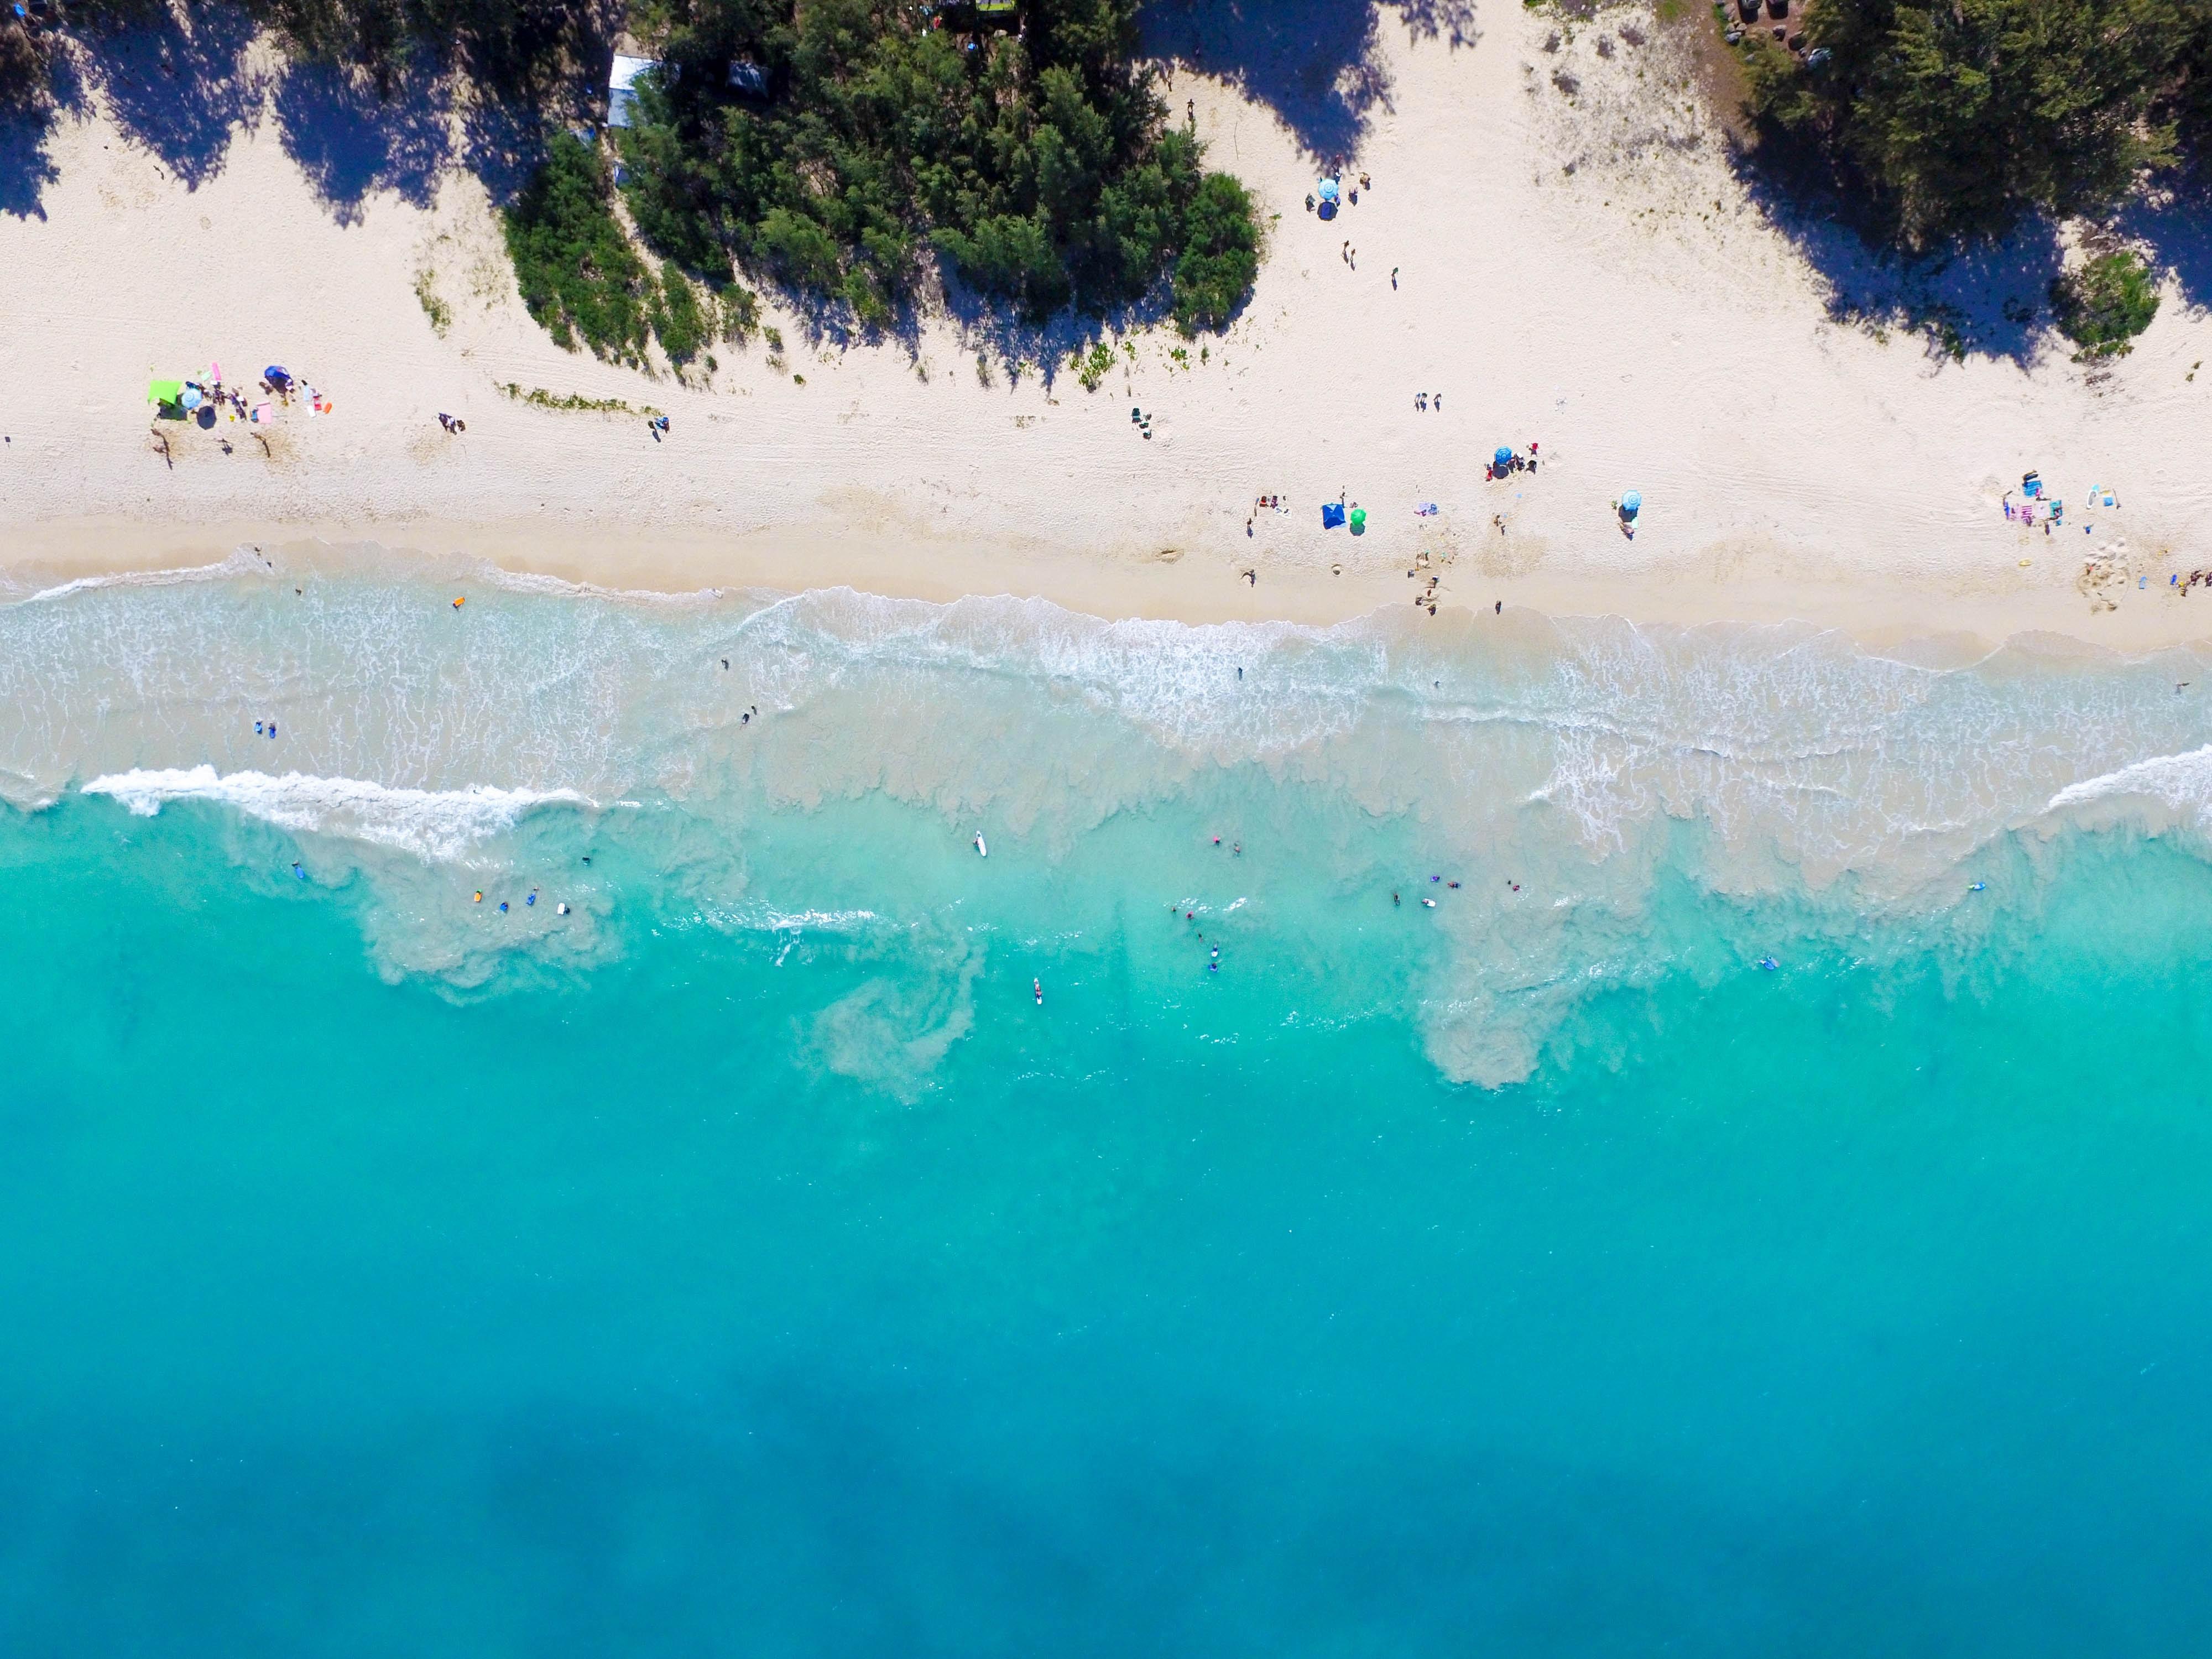 aerial view photography of people sunbathing on seashore